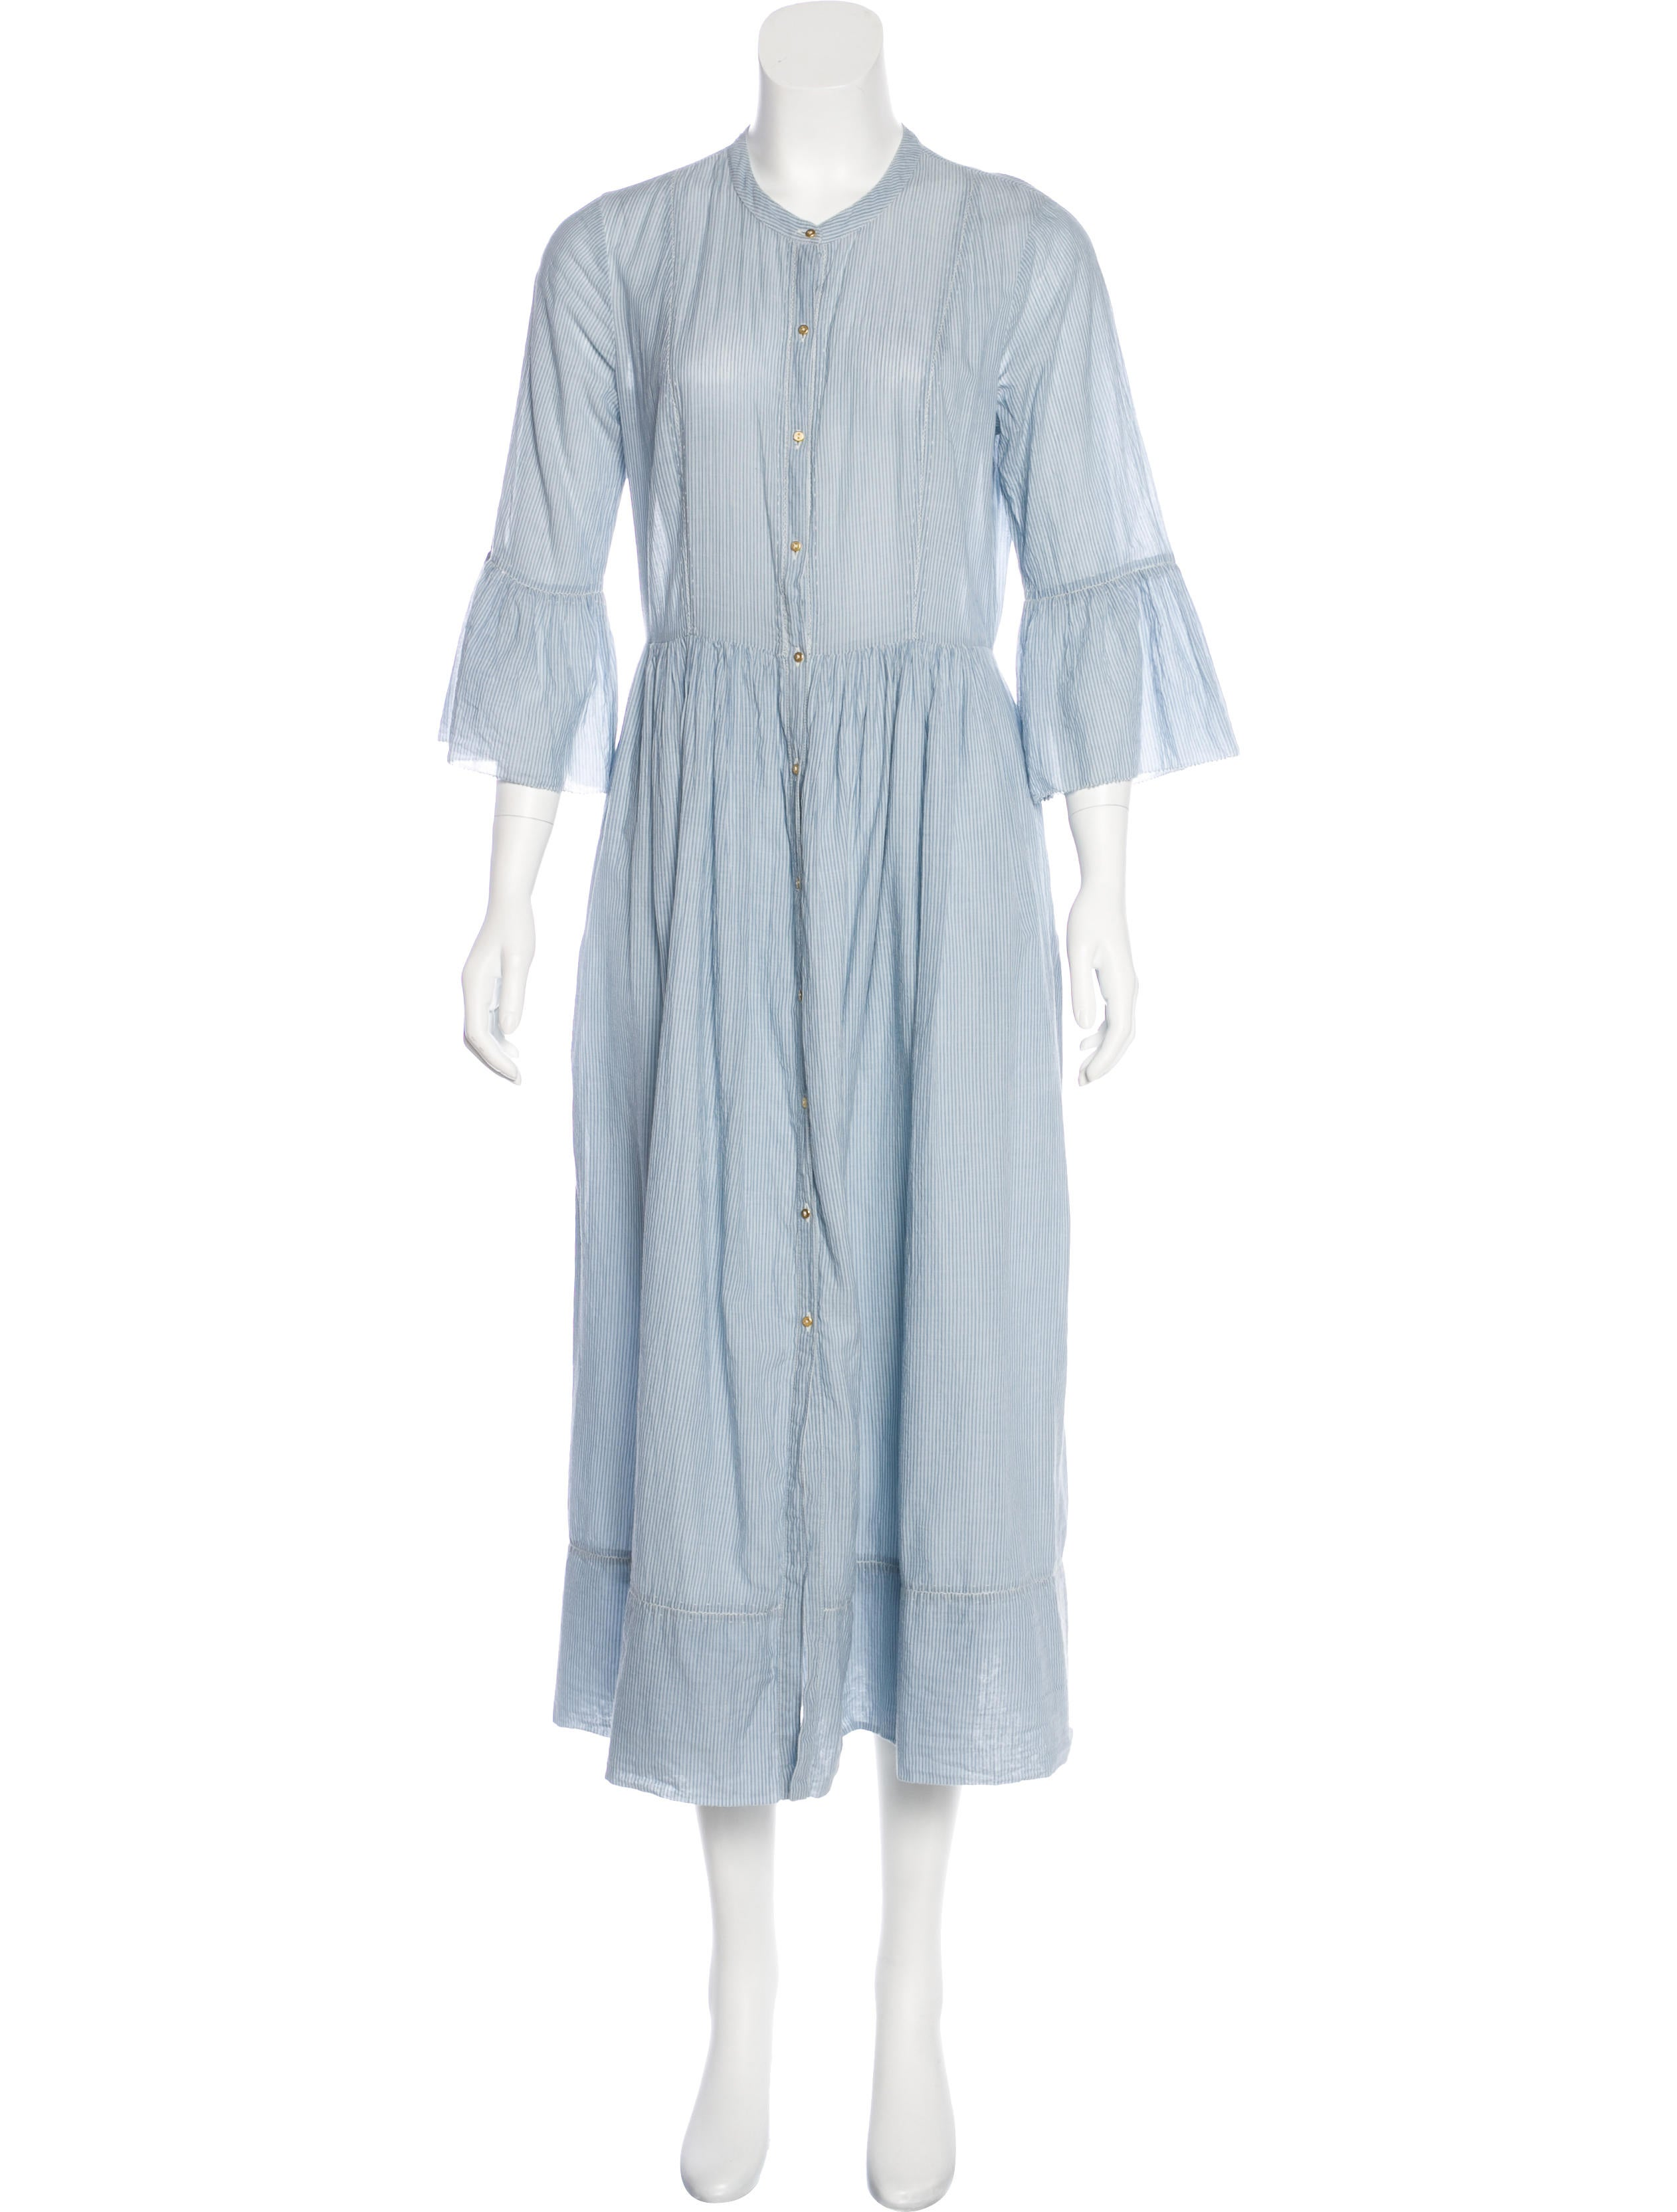 ce466ffd949 Ulla Johnson Button-Up Maxi Dress - Clothing - WUL24031